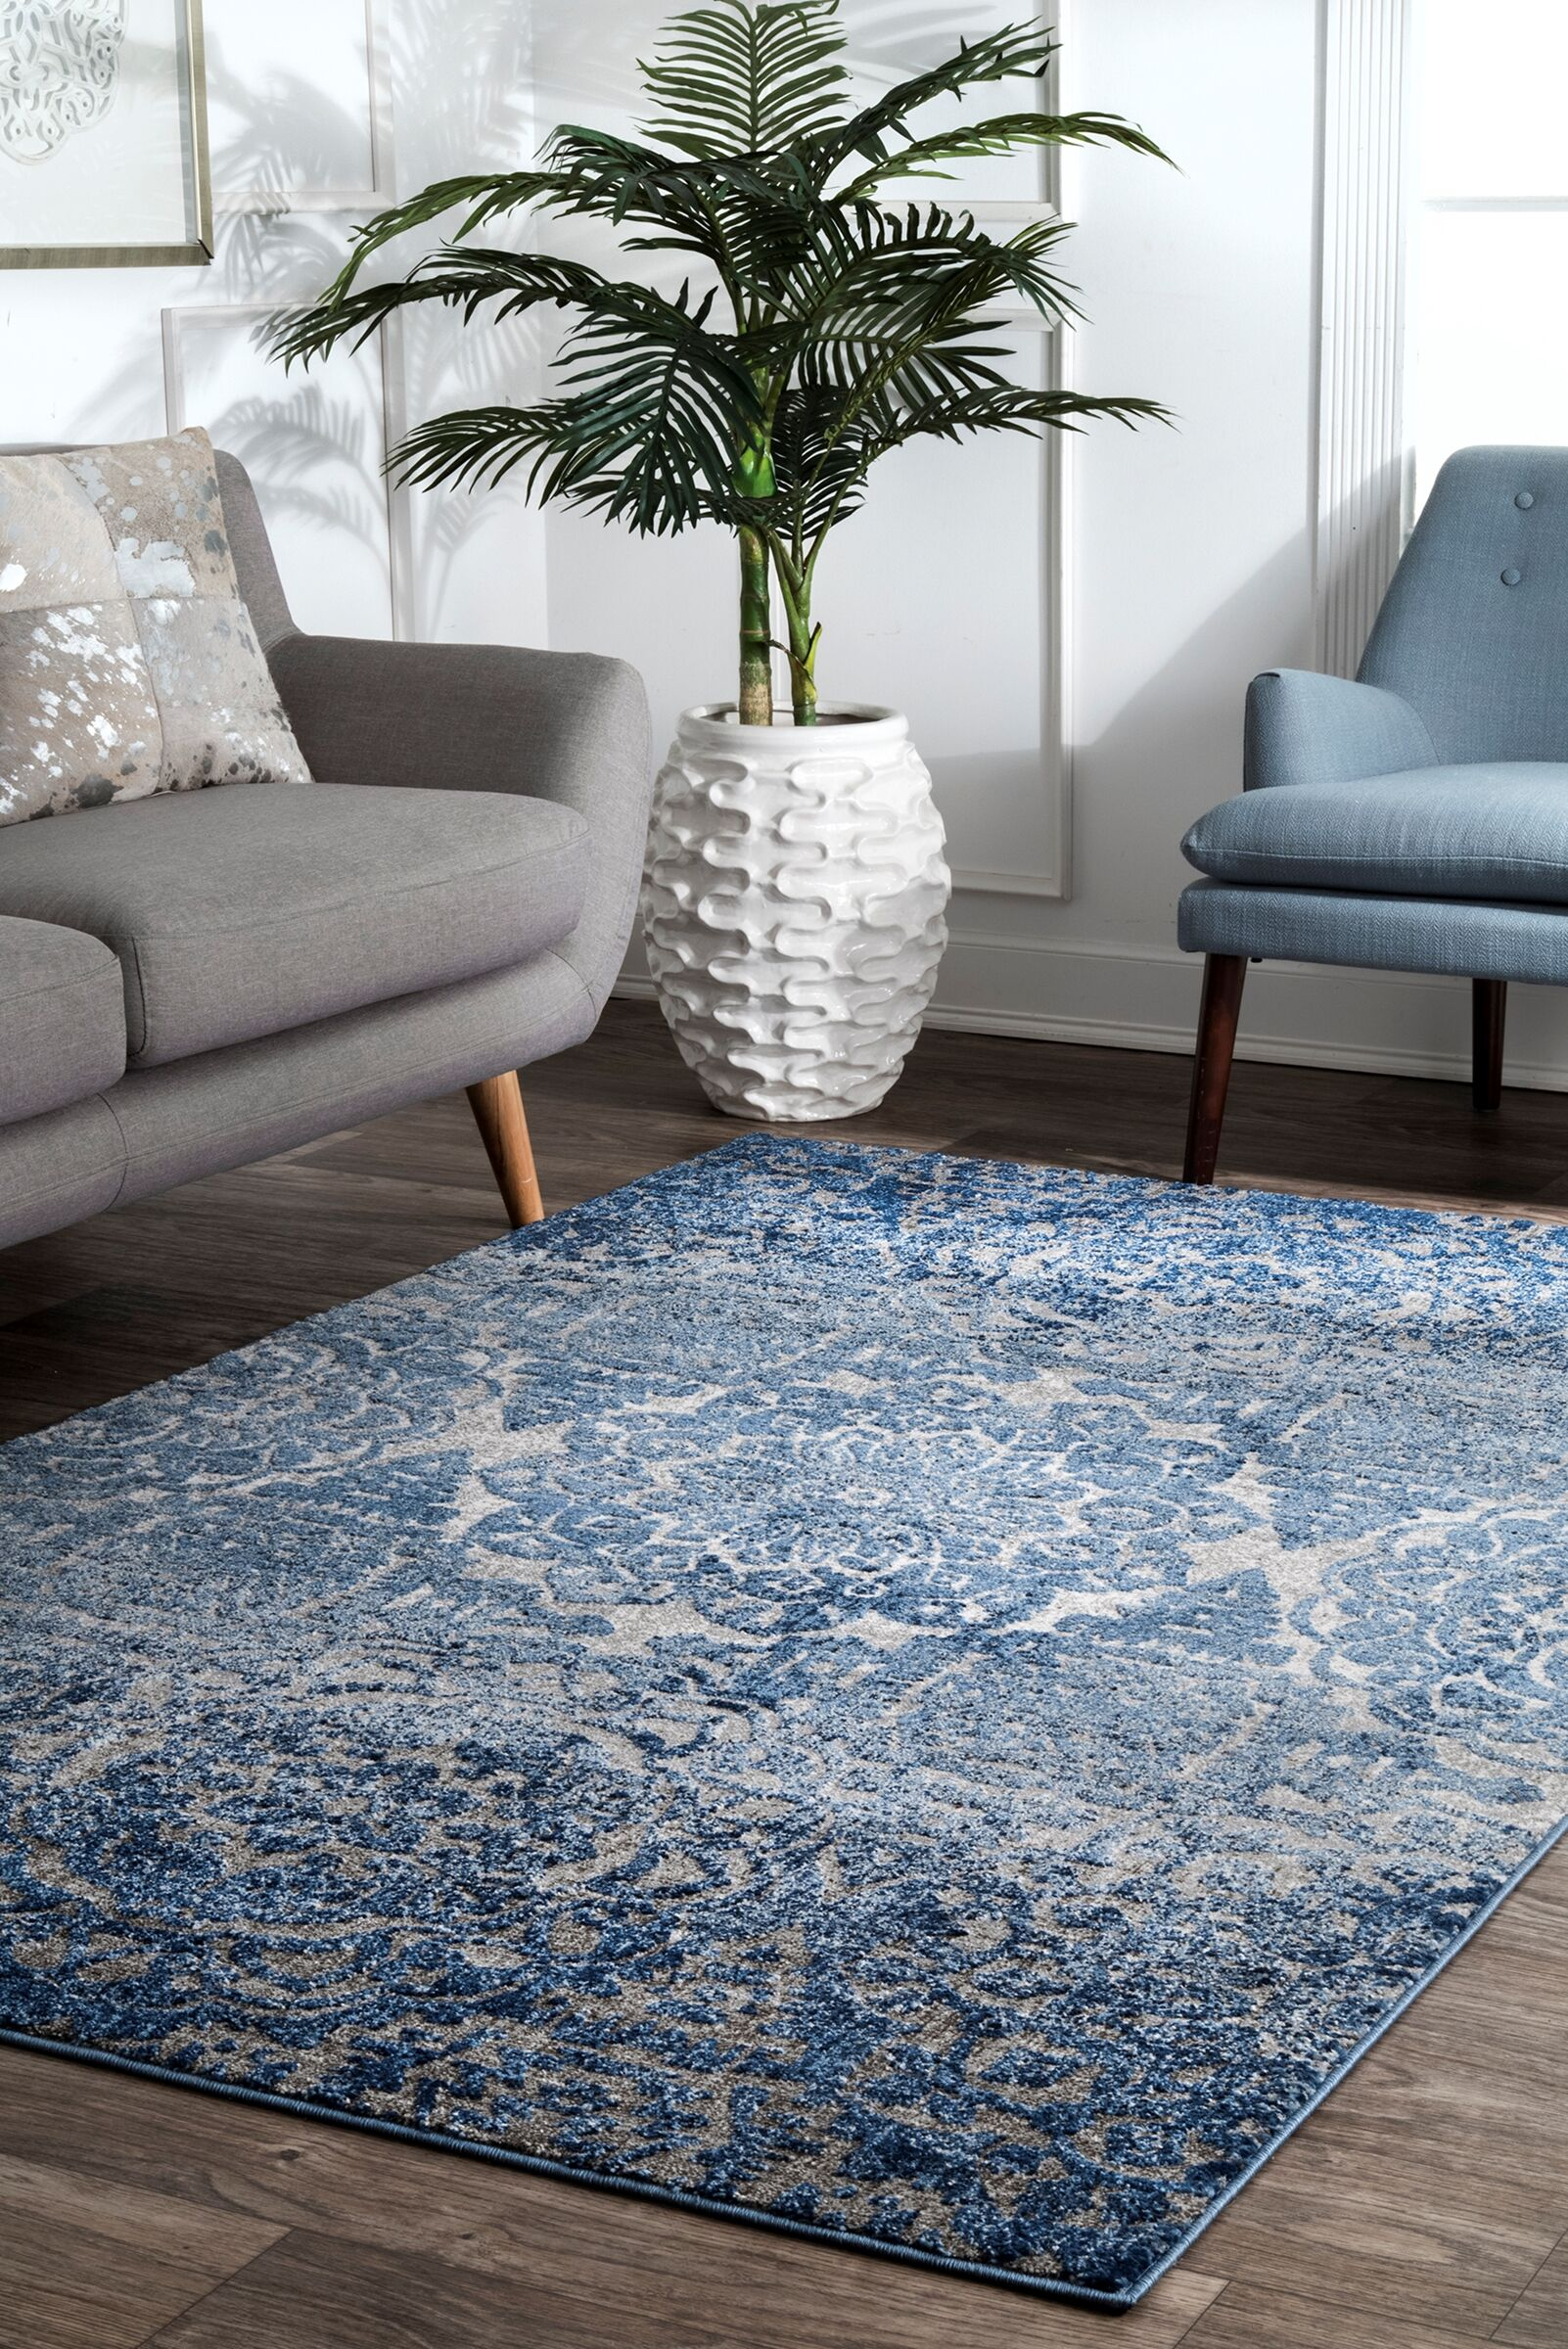 Pensford Blue Area Rug Rug Size: Rectangle 5' x 7'5